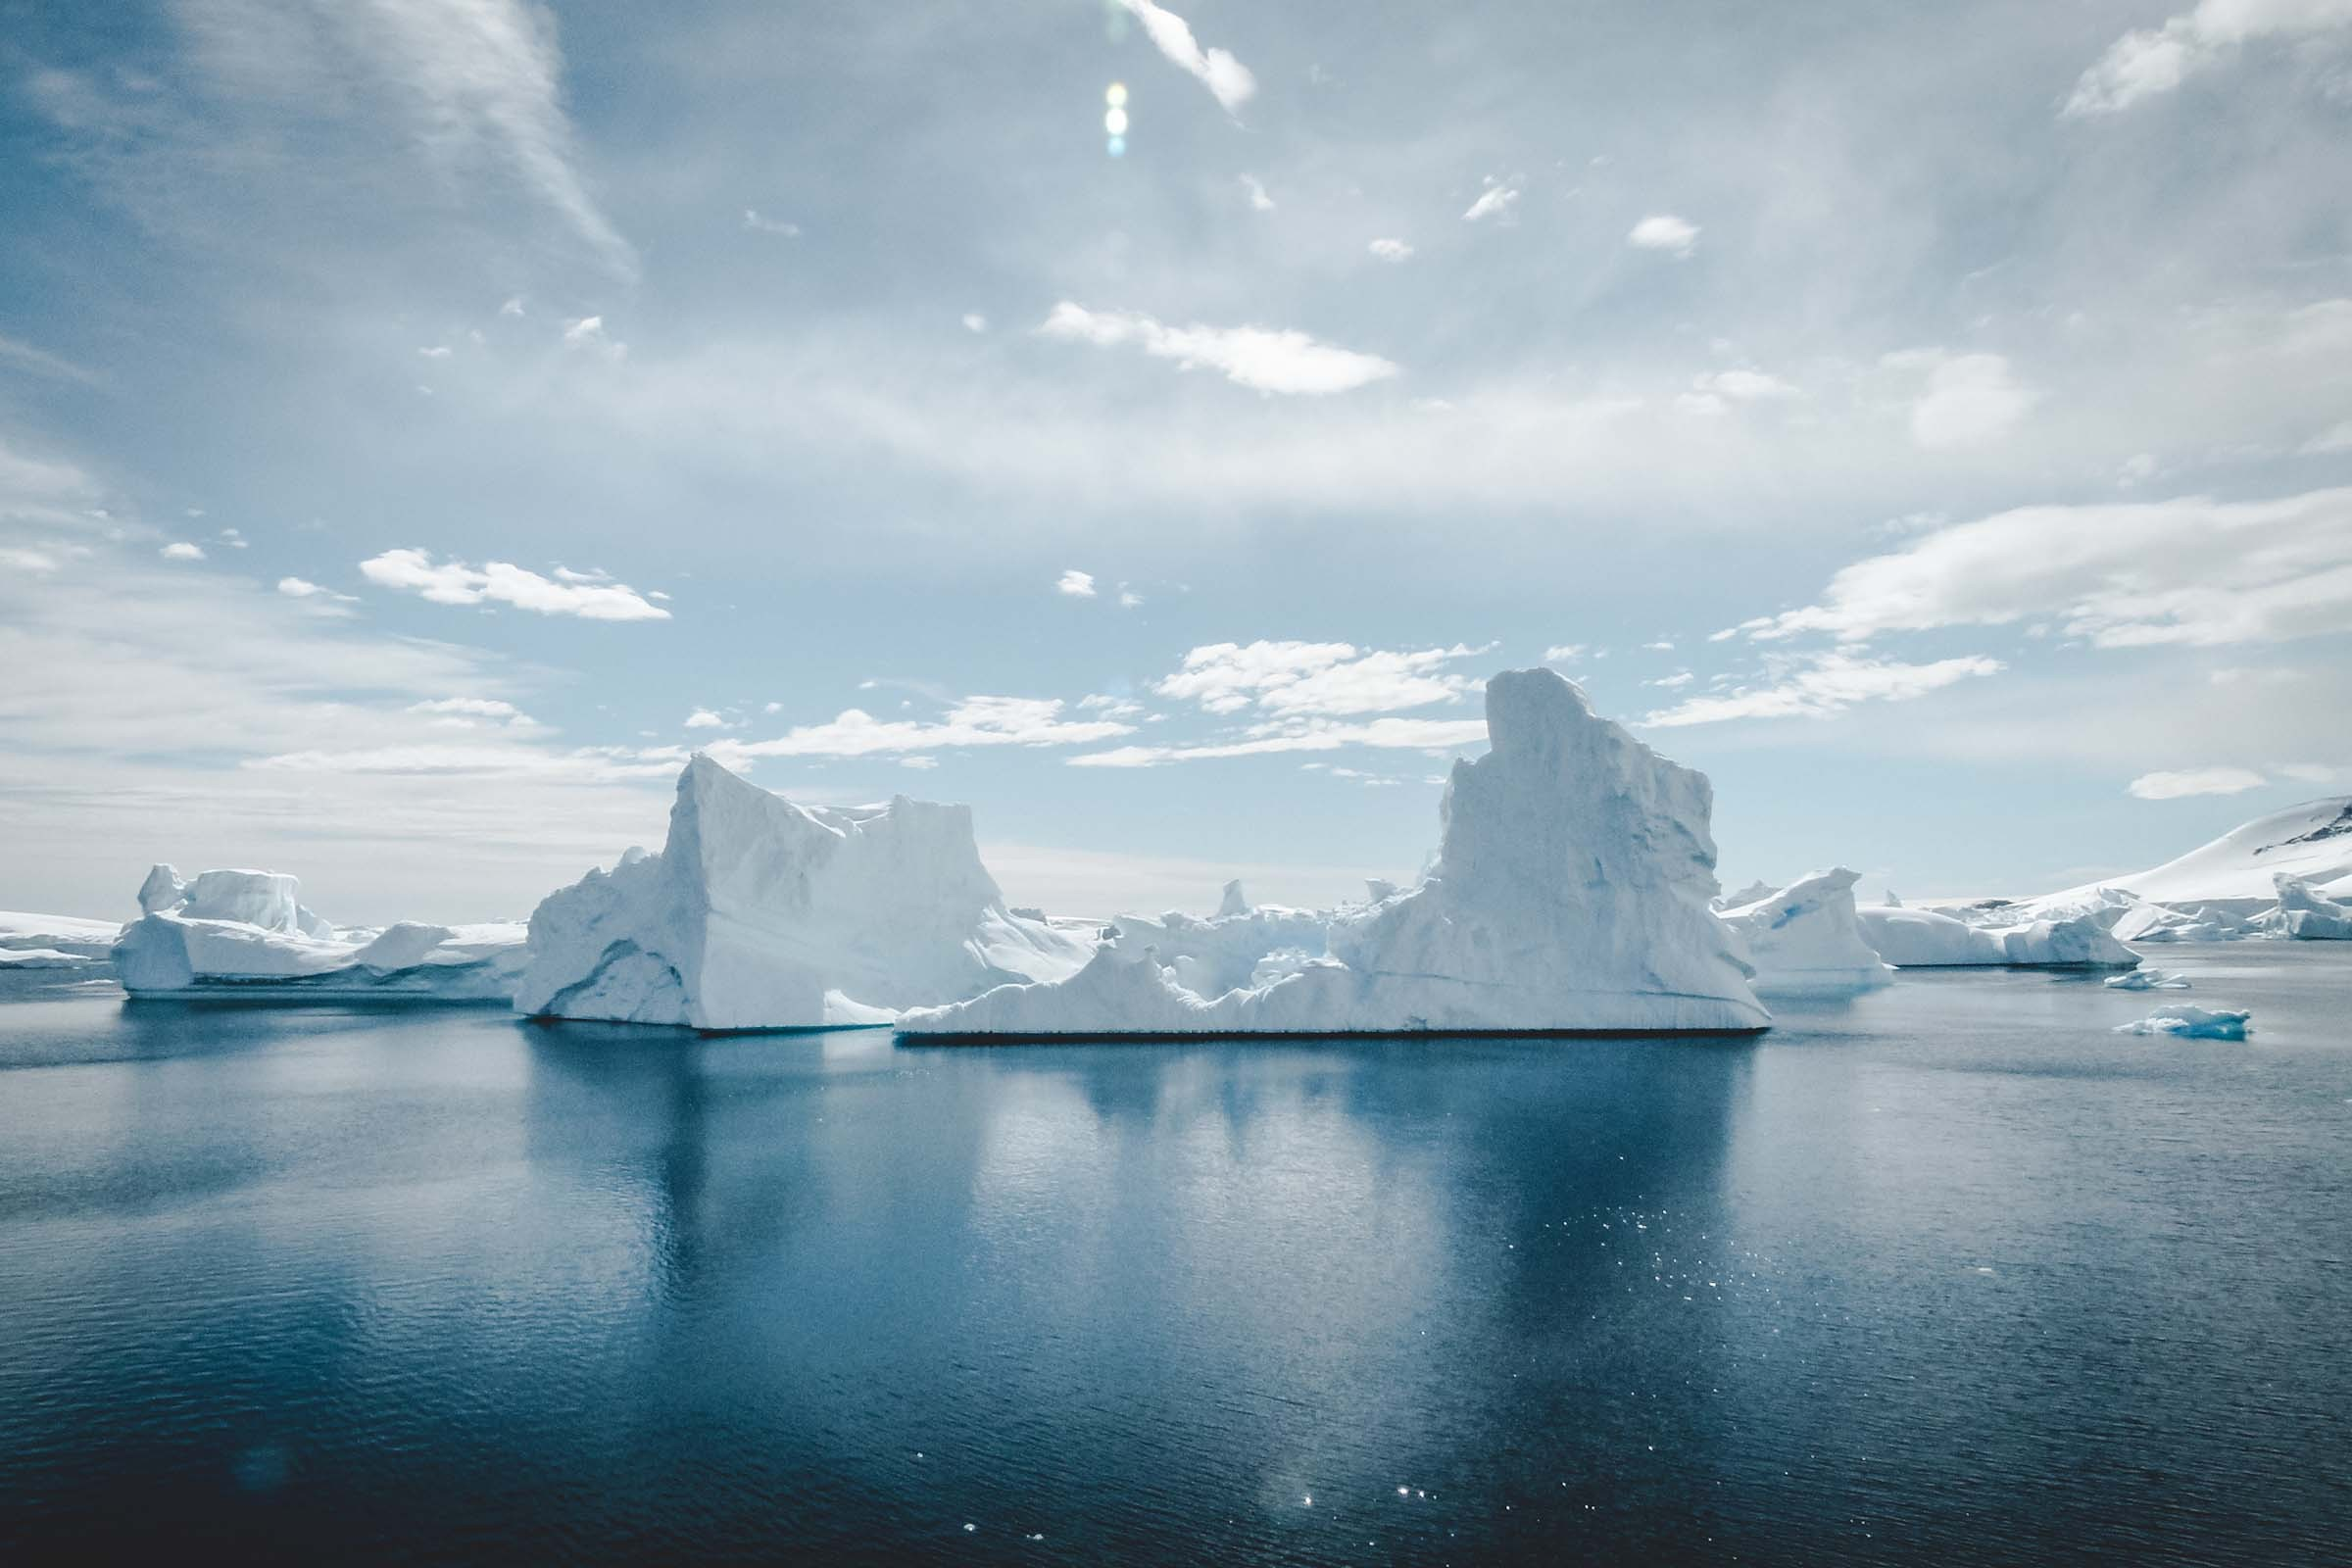 antarctica-iceberg-e1445690431719